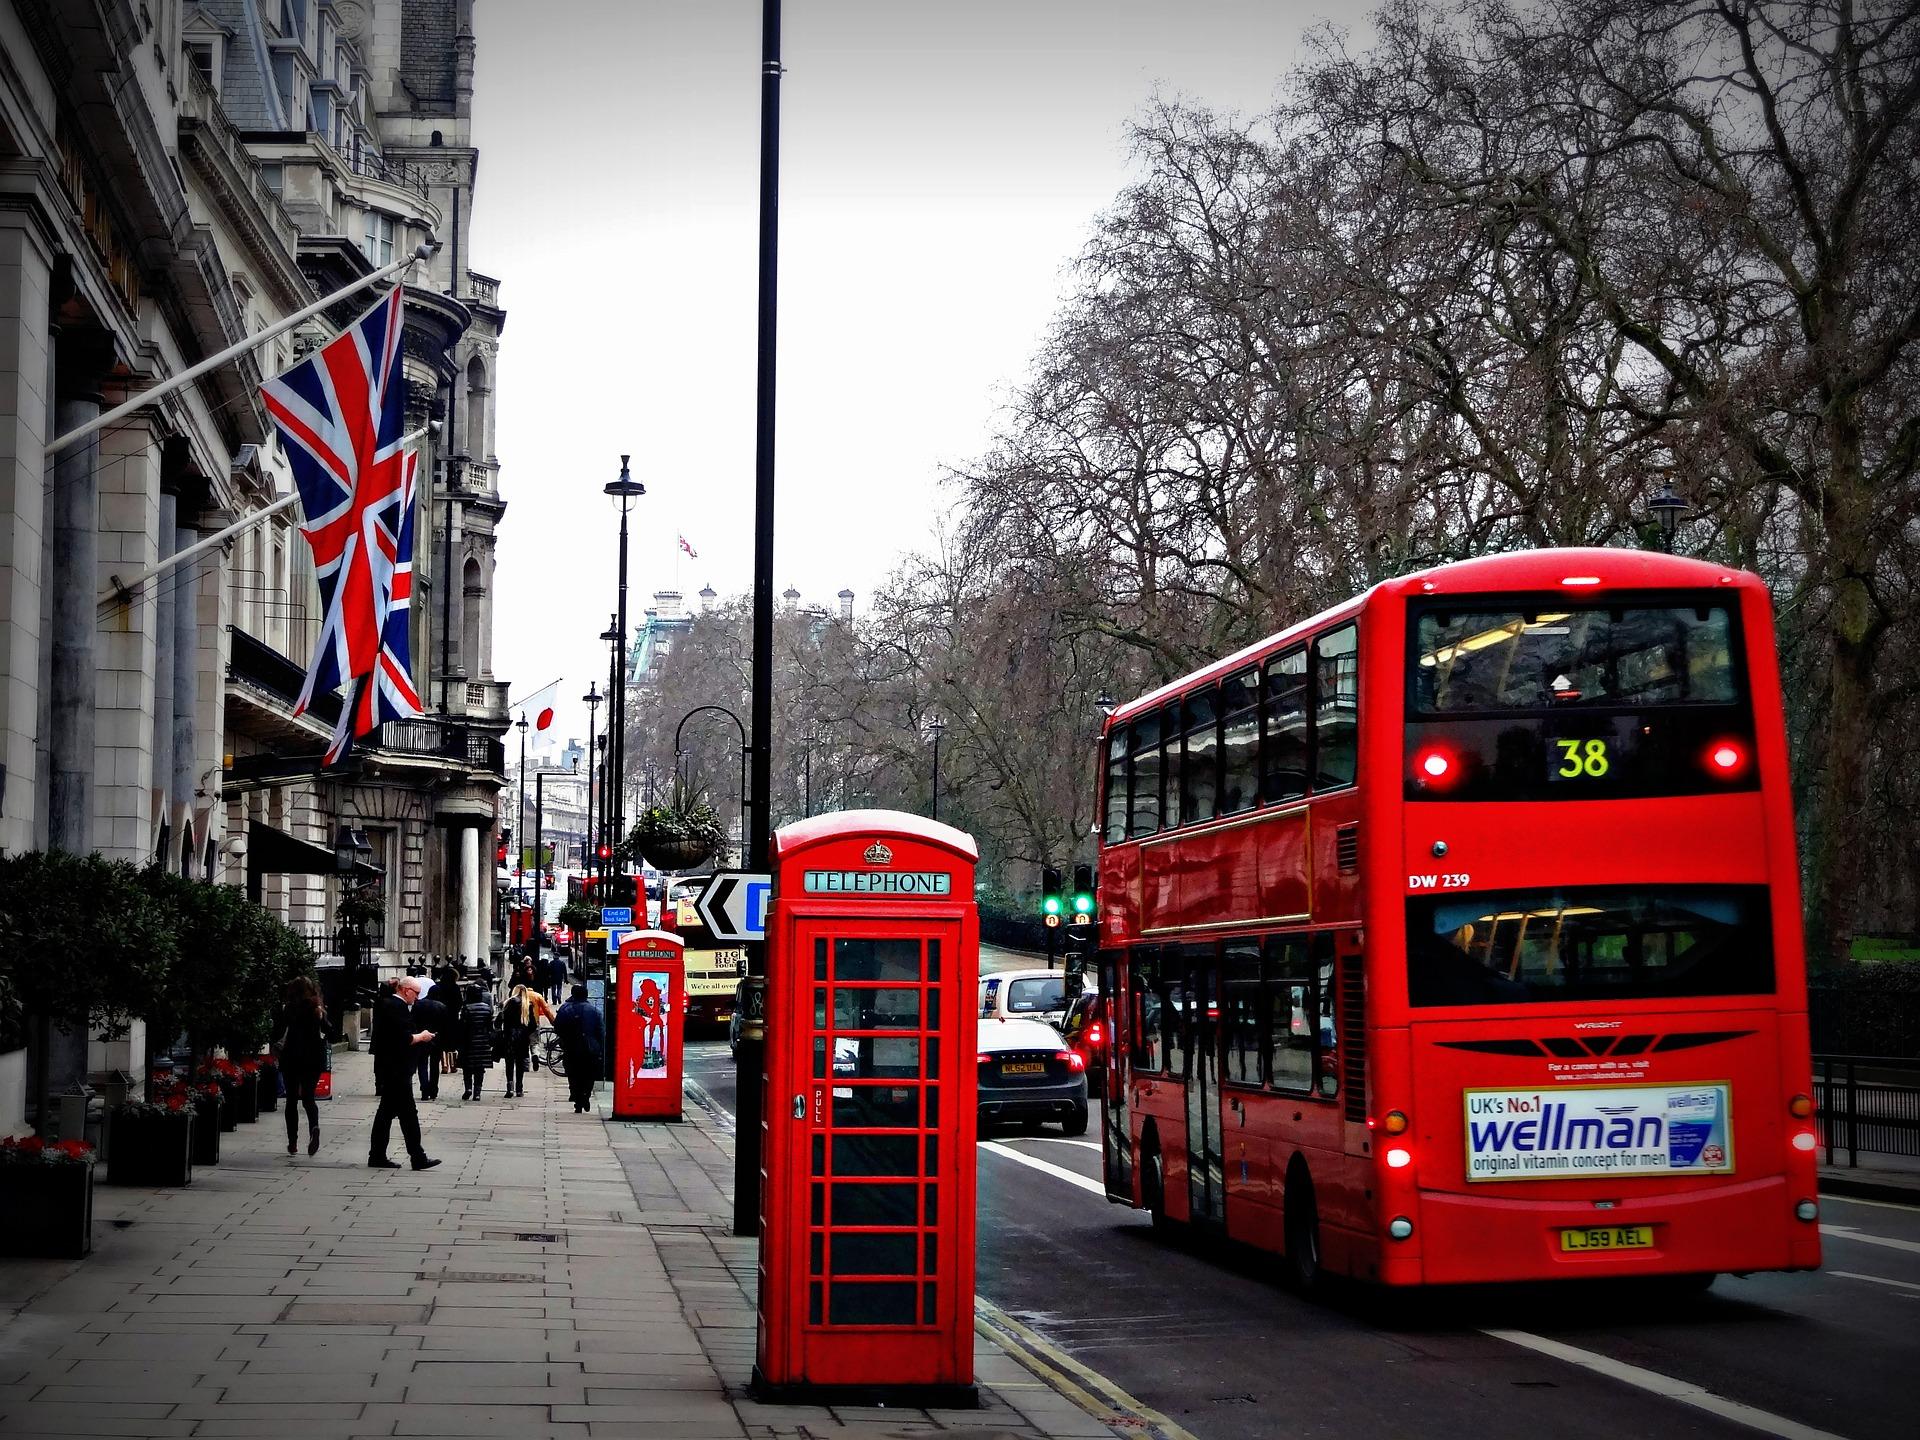 Ingiltere Şehirler - Londra telephone and bus